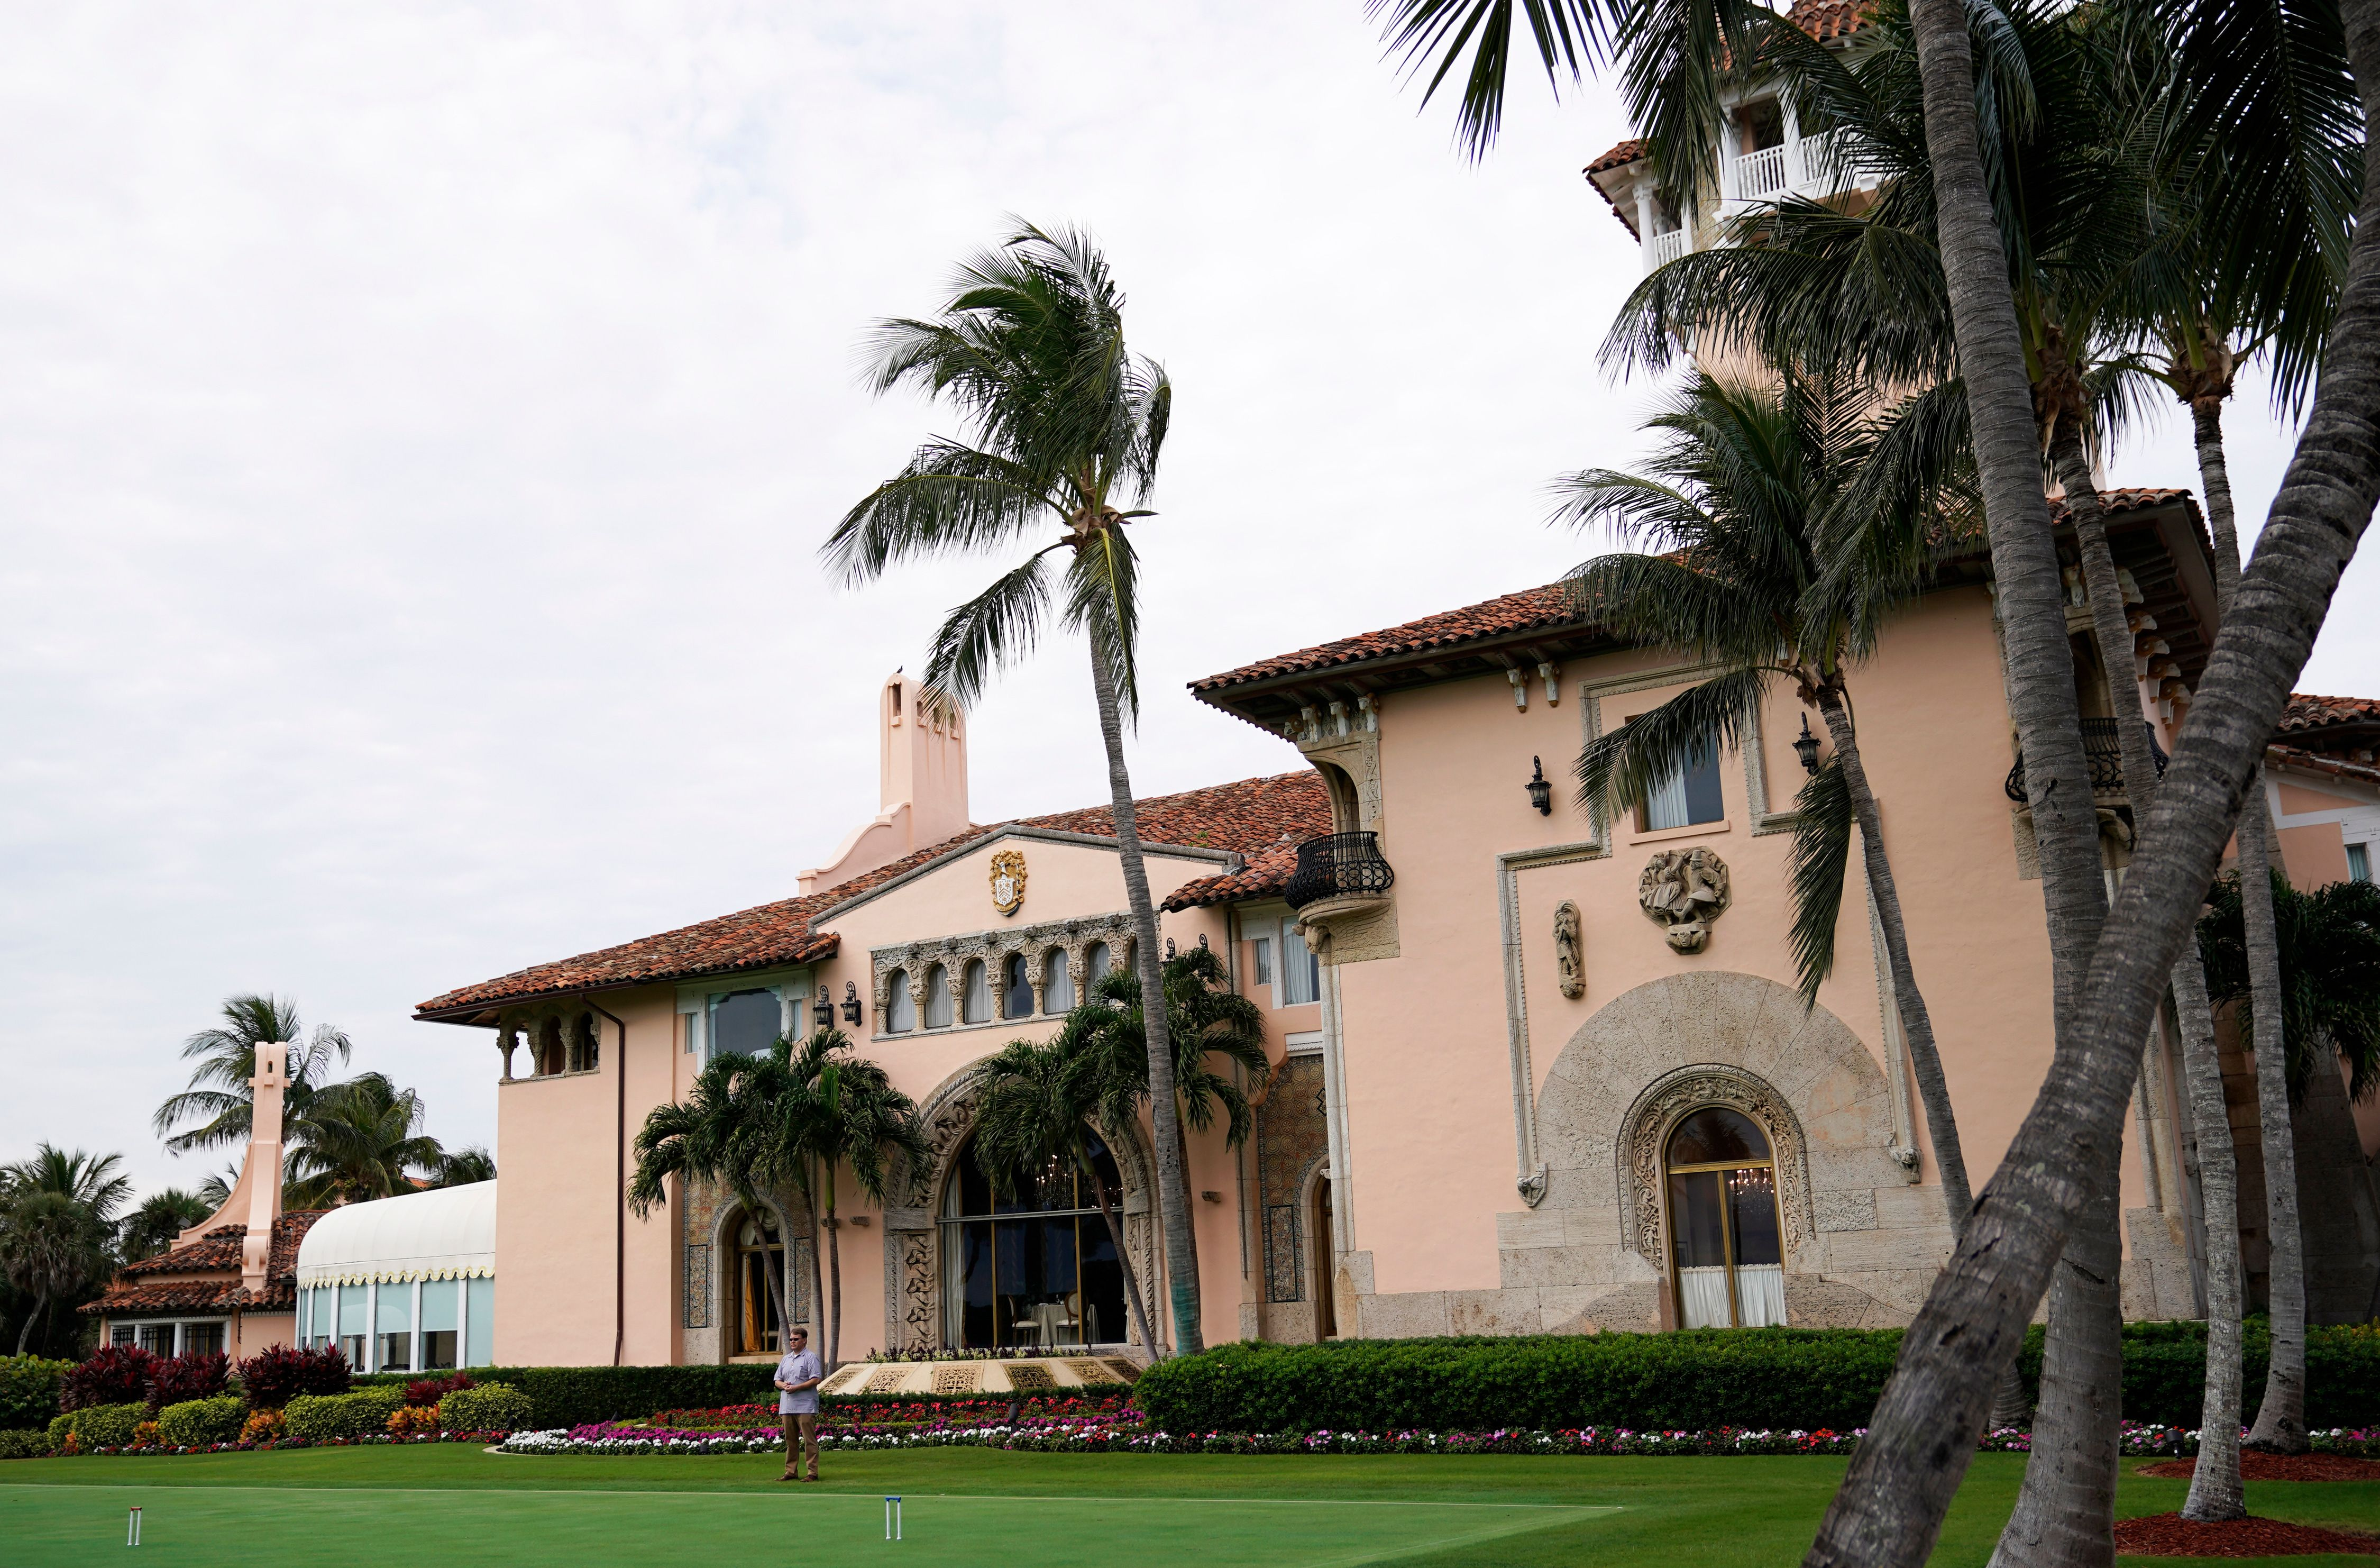 S President Donald Trump's Mar-a-Lago resort in Palm Beach, Florida